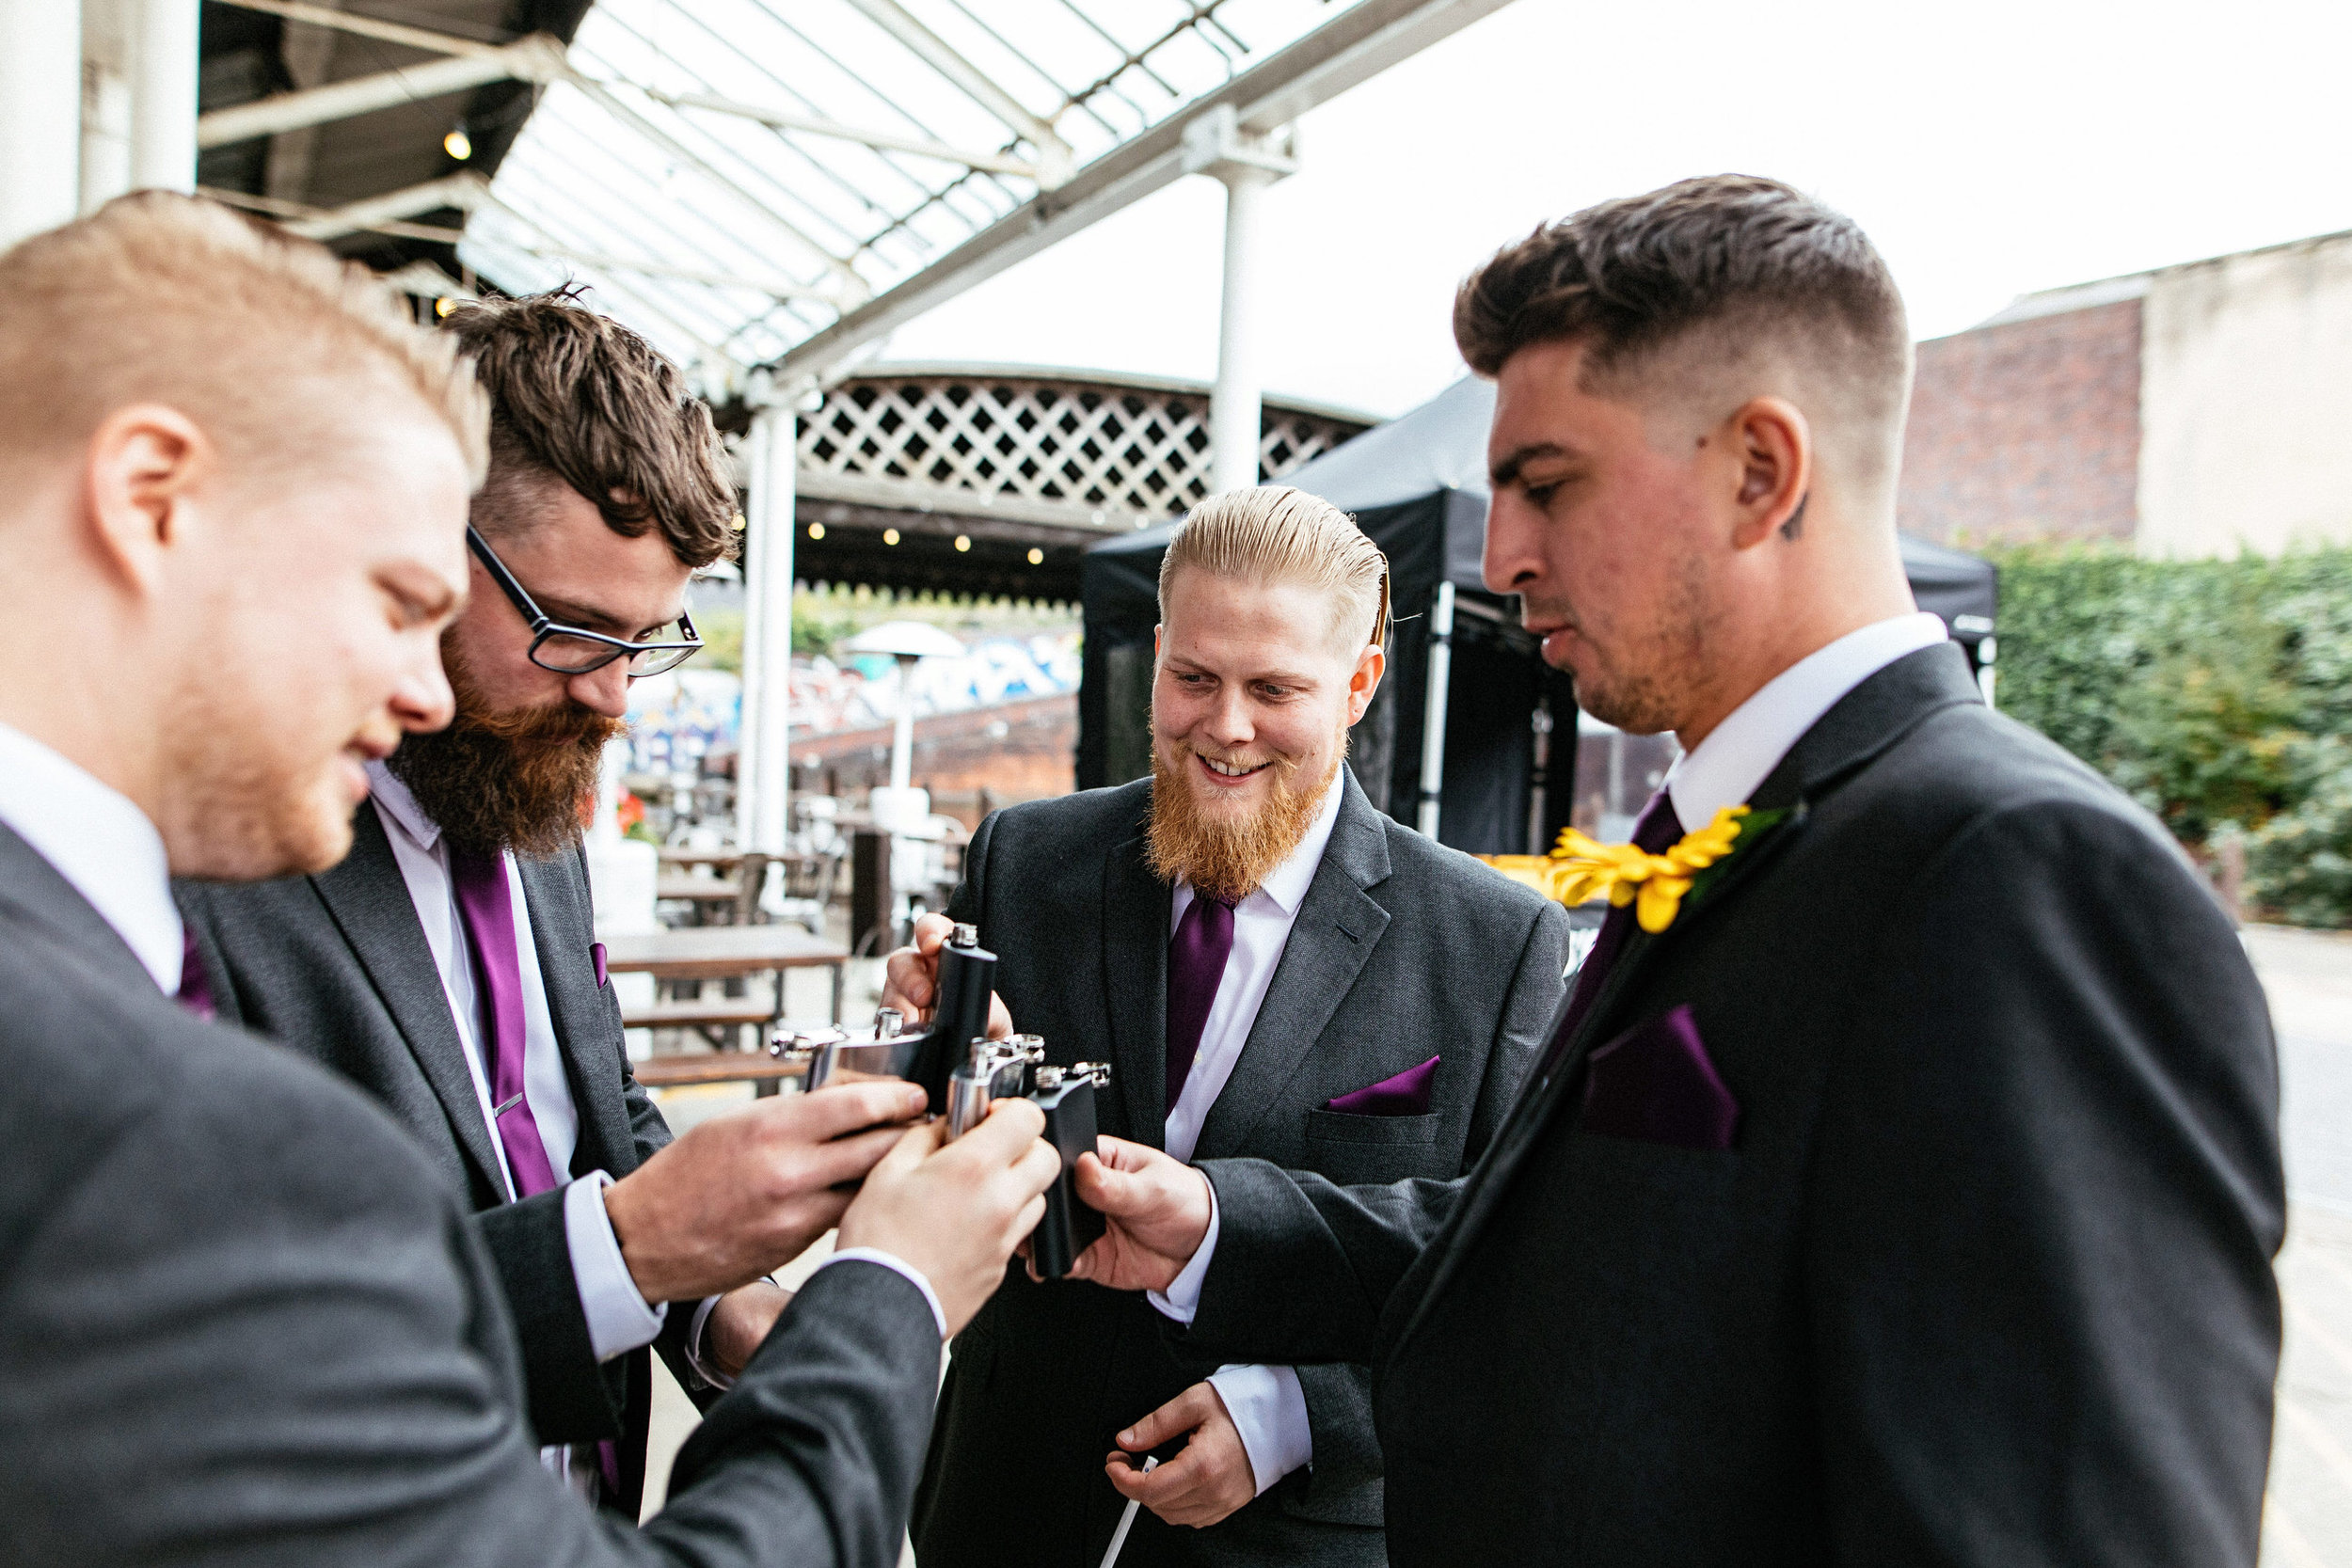 The-Bond-Company-Wedding-Photography-20-1.jpg